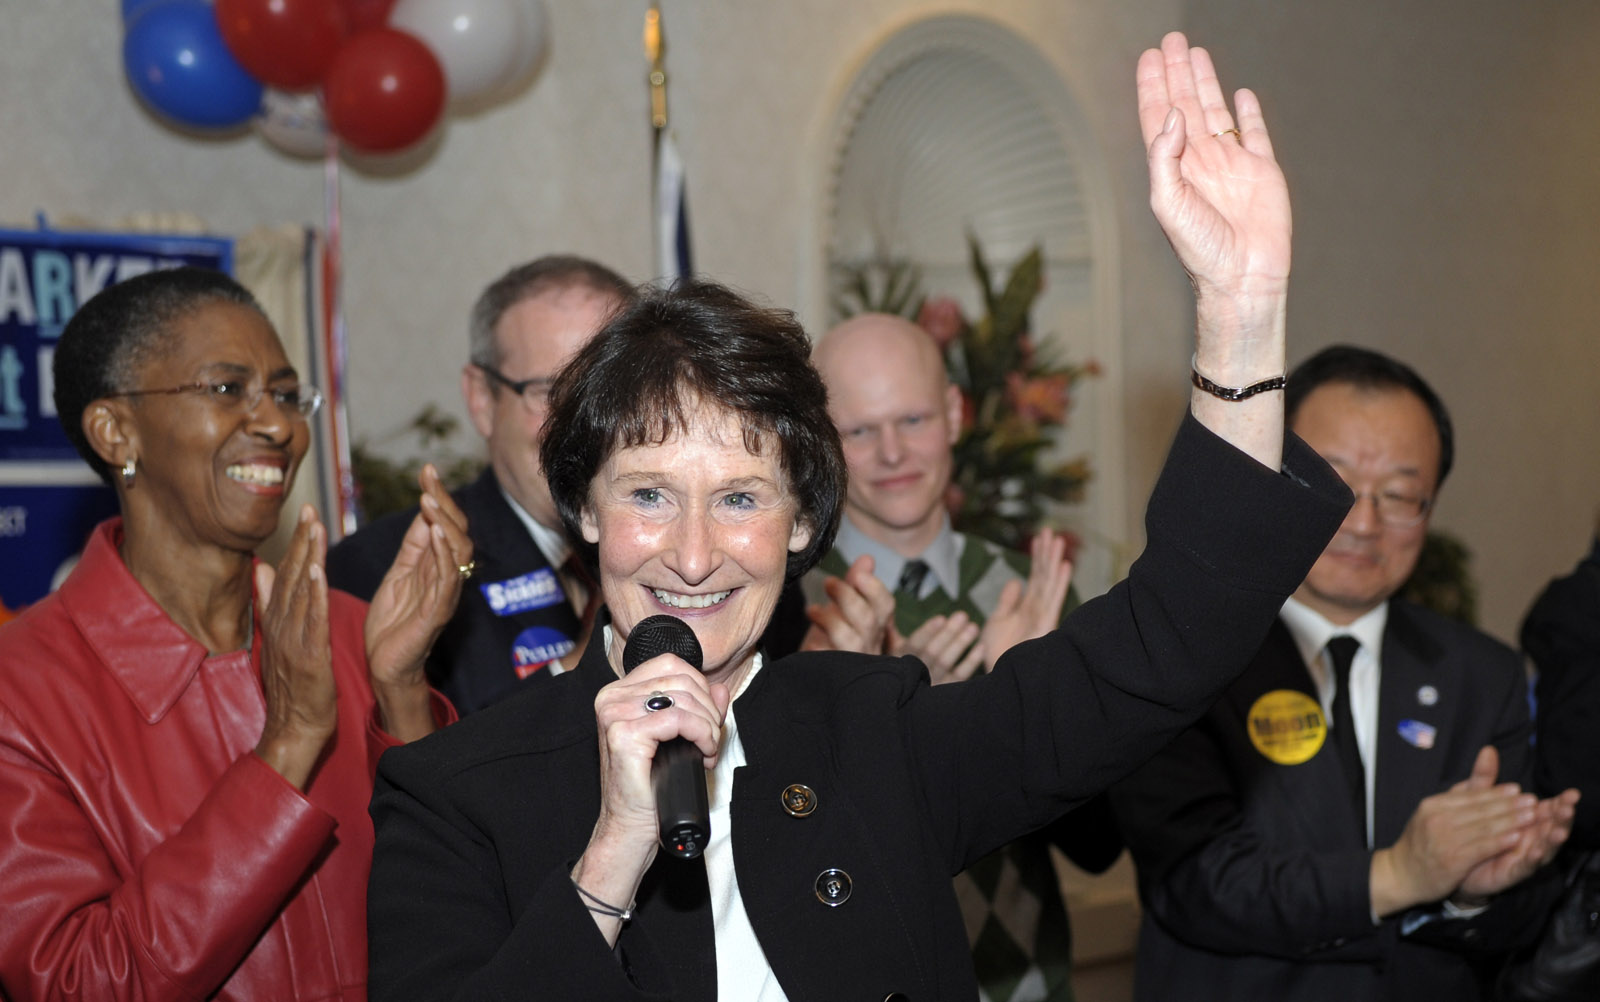 Bulova will not seek third term at helm of Fairfax County